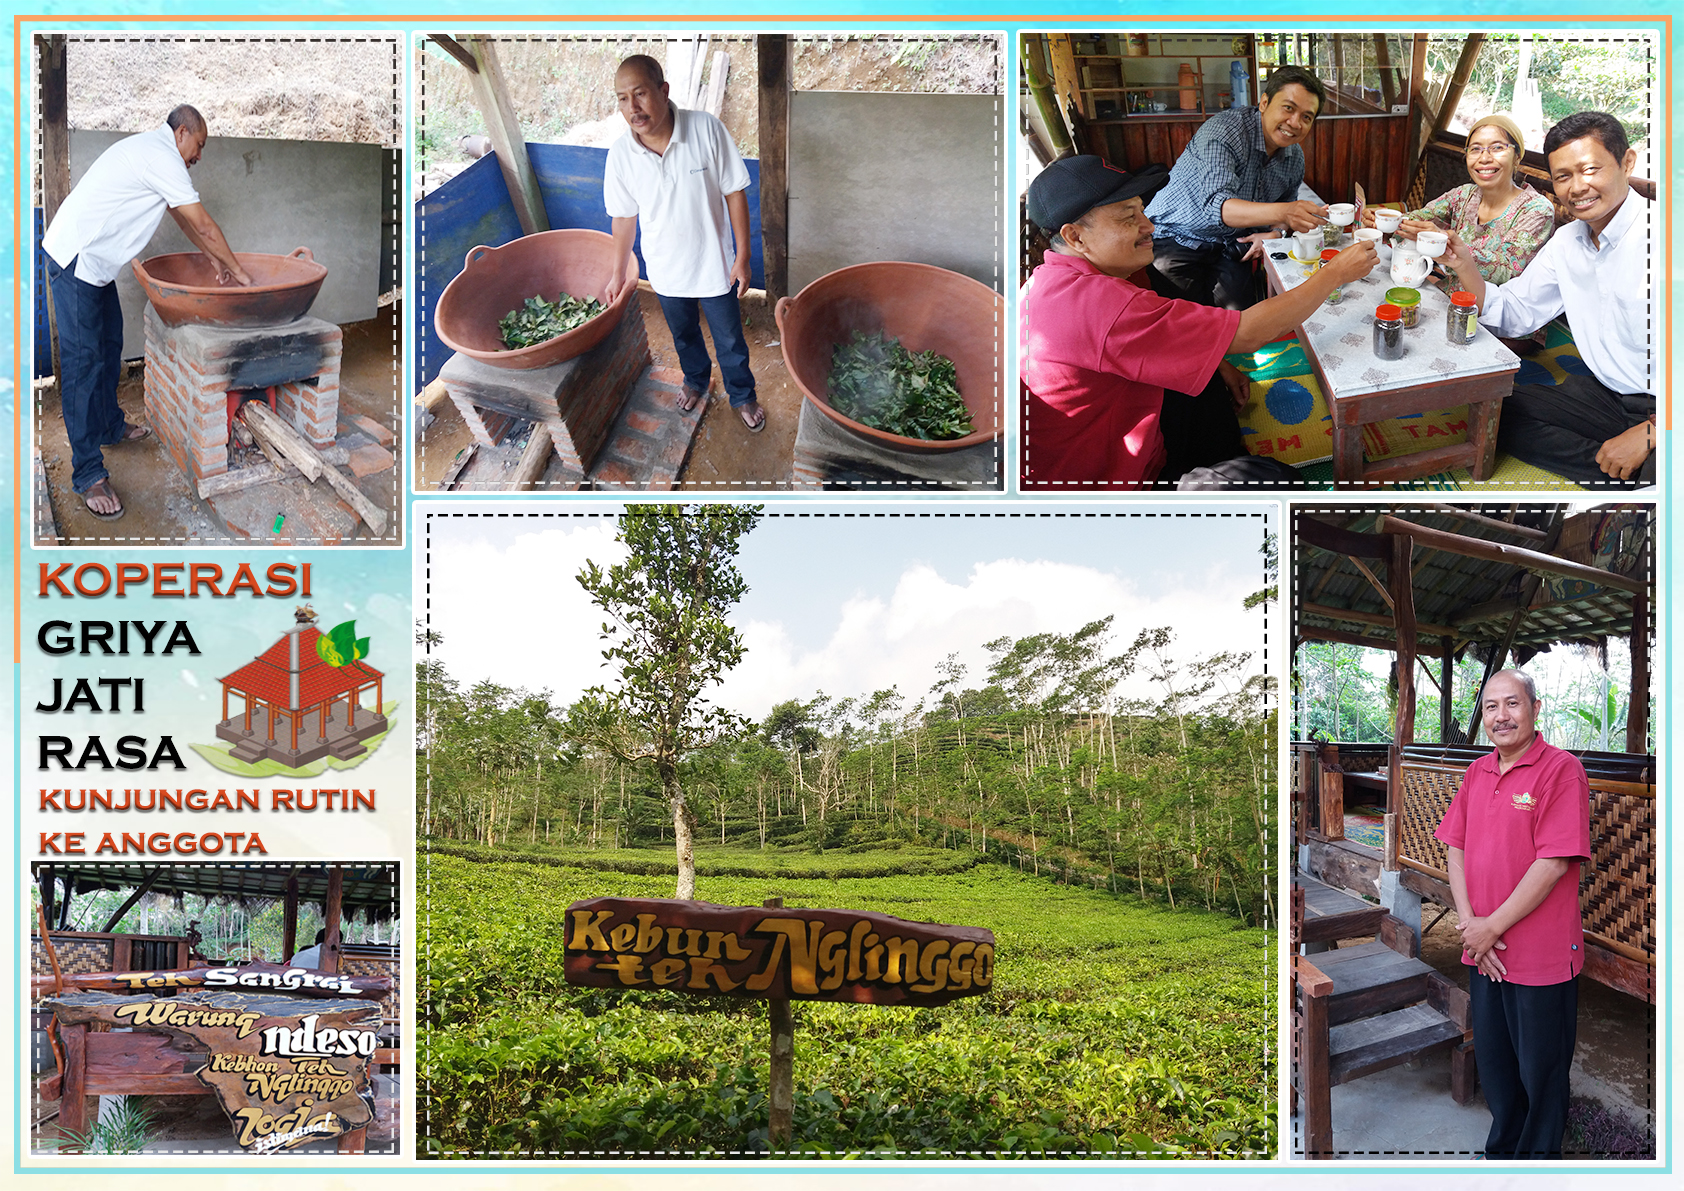 Sukahadi's tea plantation, including photos of Sukahadi roasting tea and welcoming visitors from Duta Wacana Christian University.